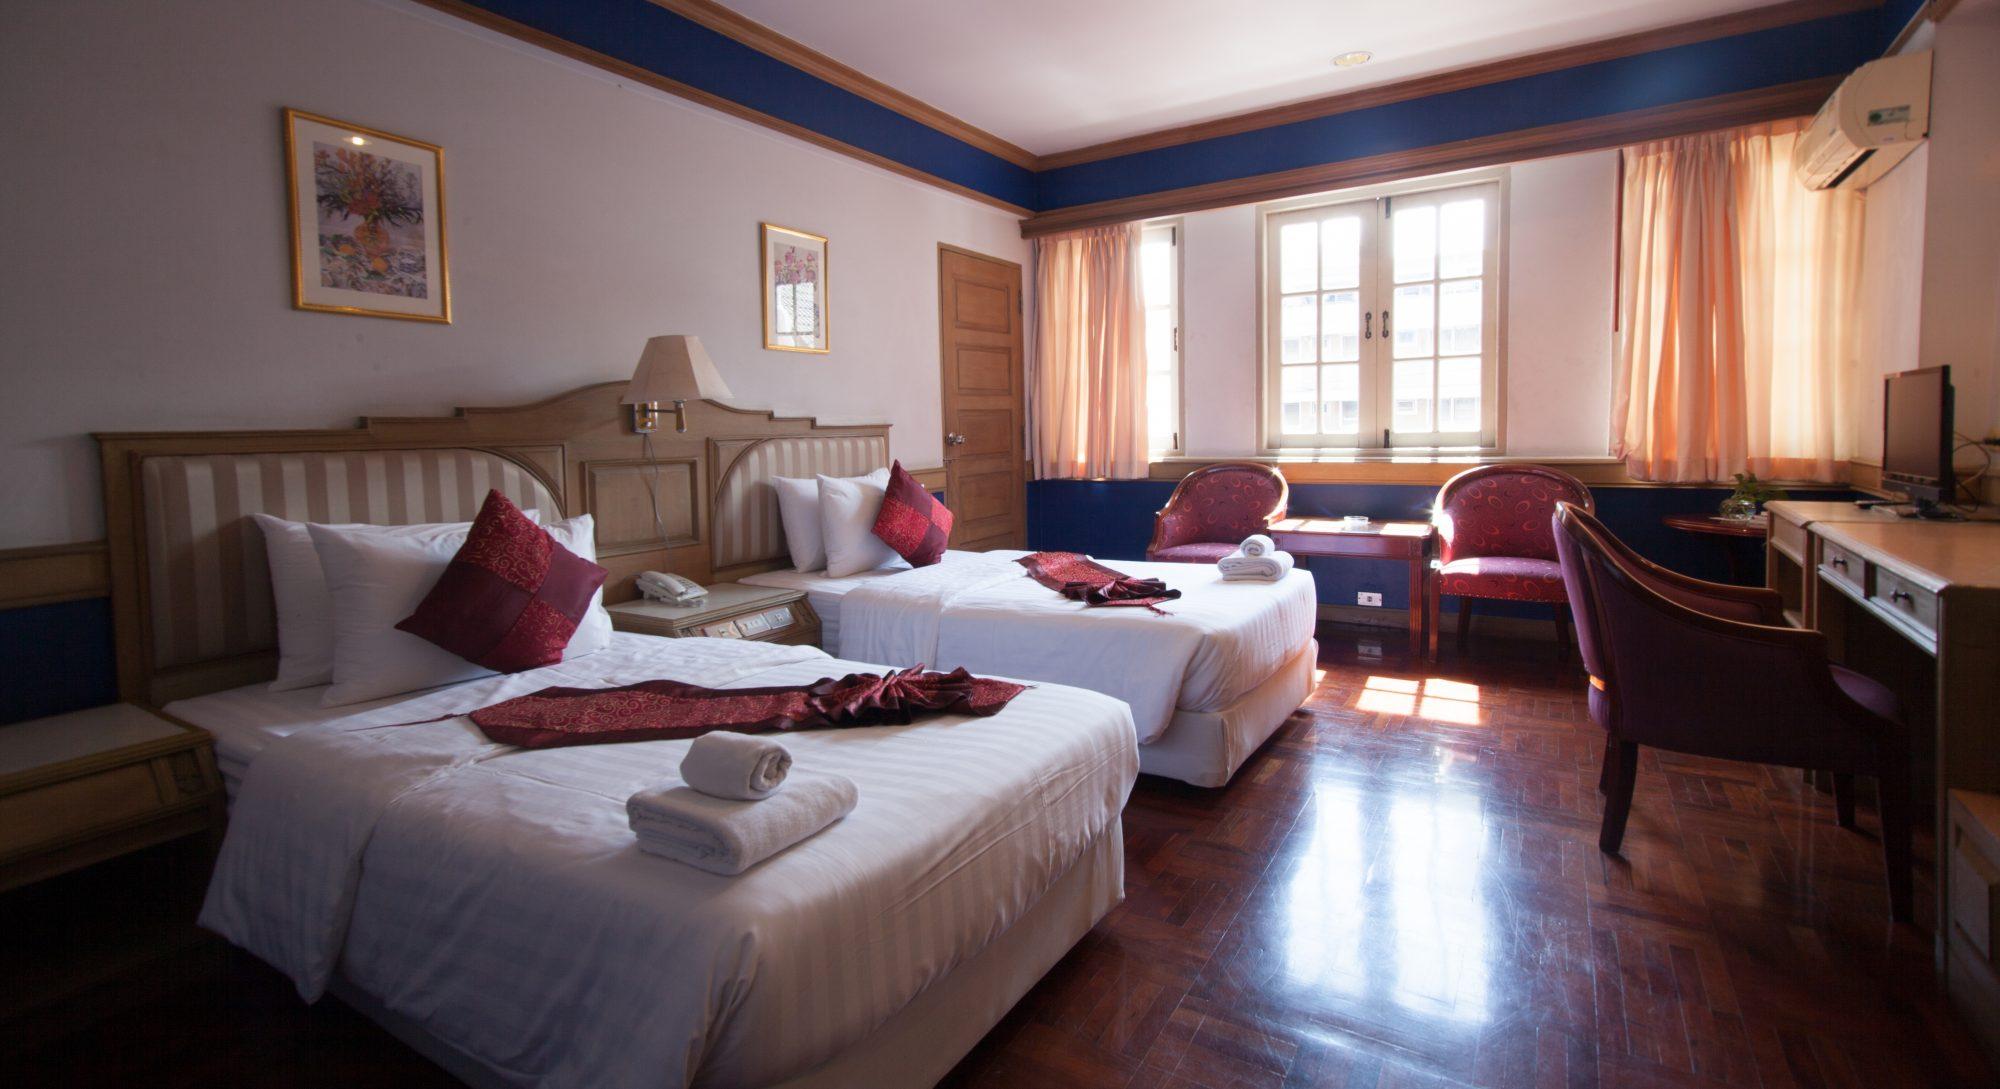 Suda Palace Hotel โรงแรม สุดา พาเลซ